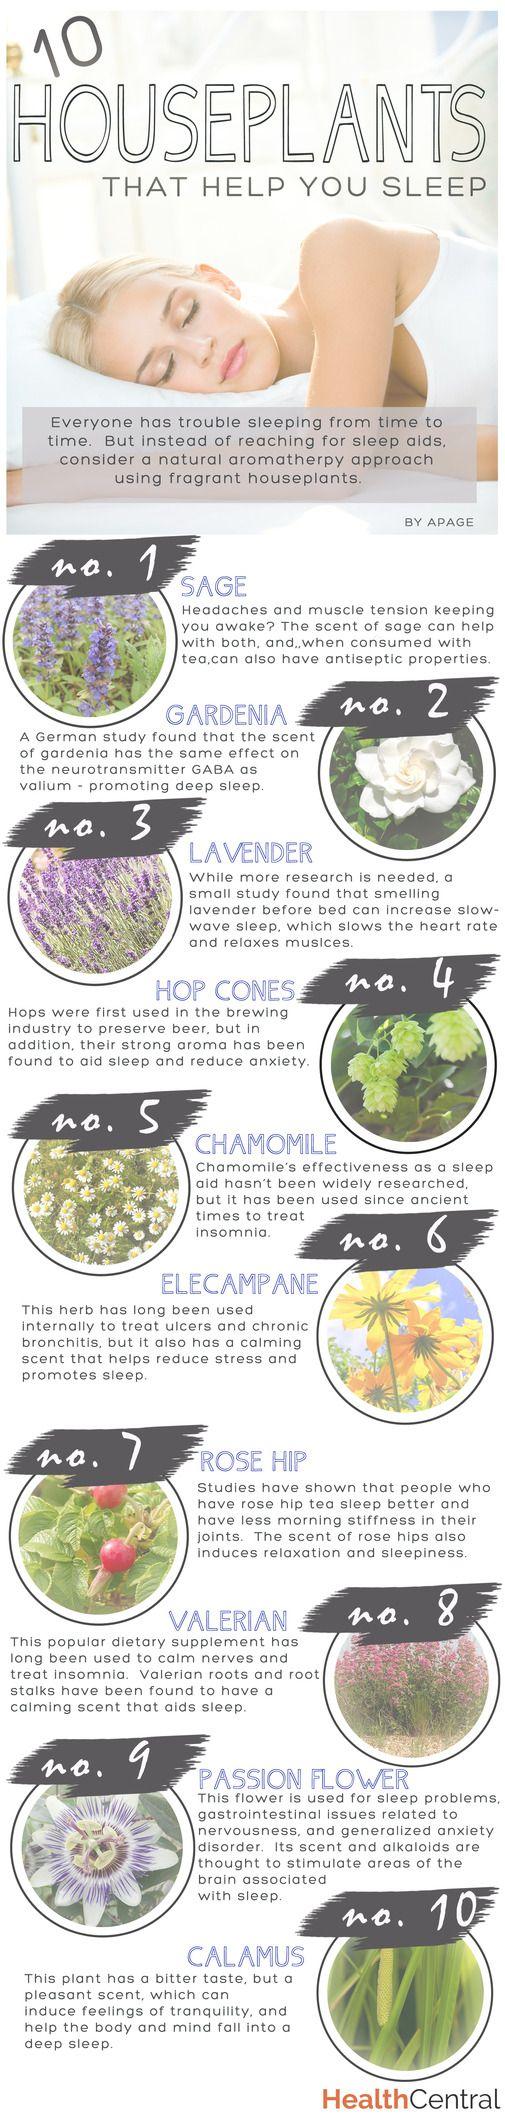 Houseplants for Better Sleep - Health Infographic Design